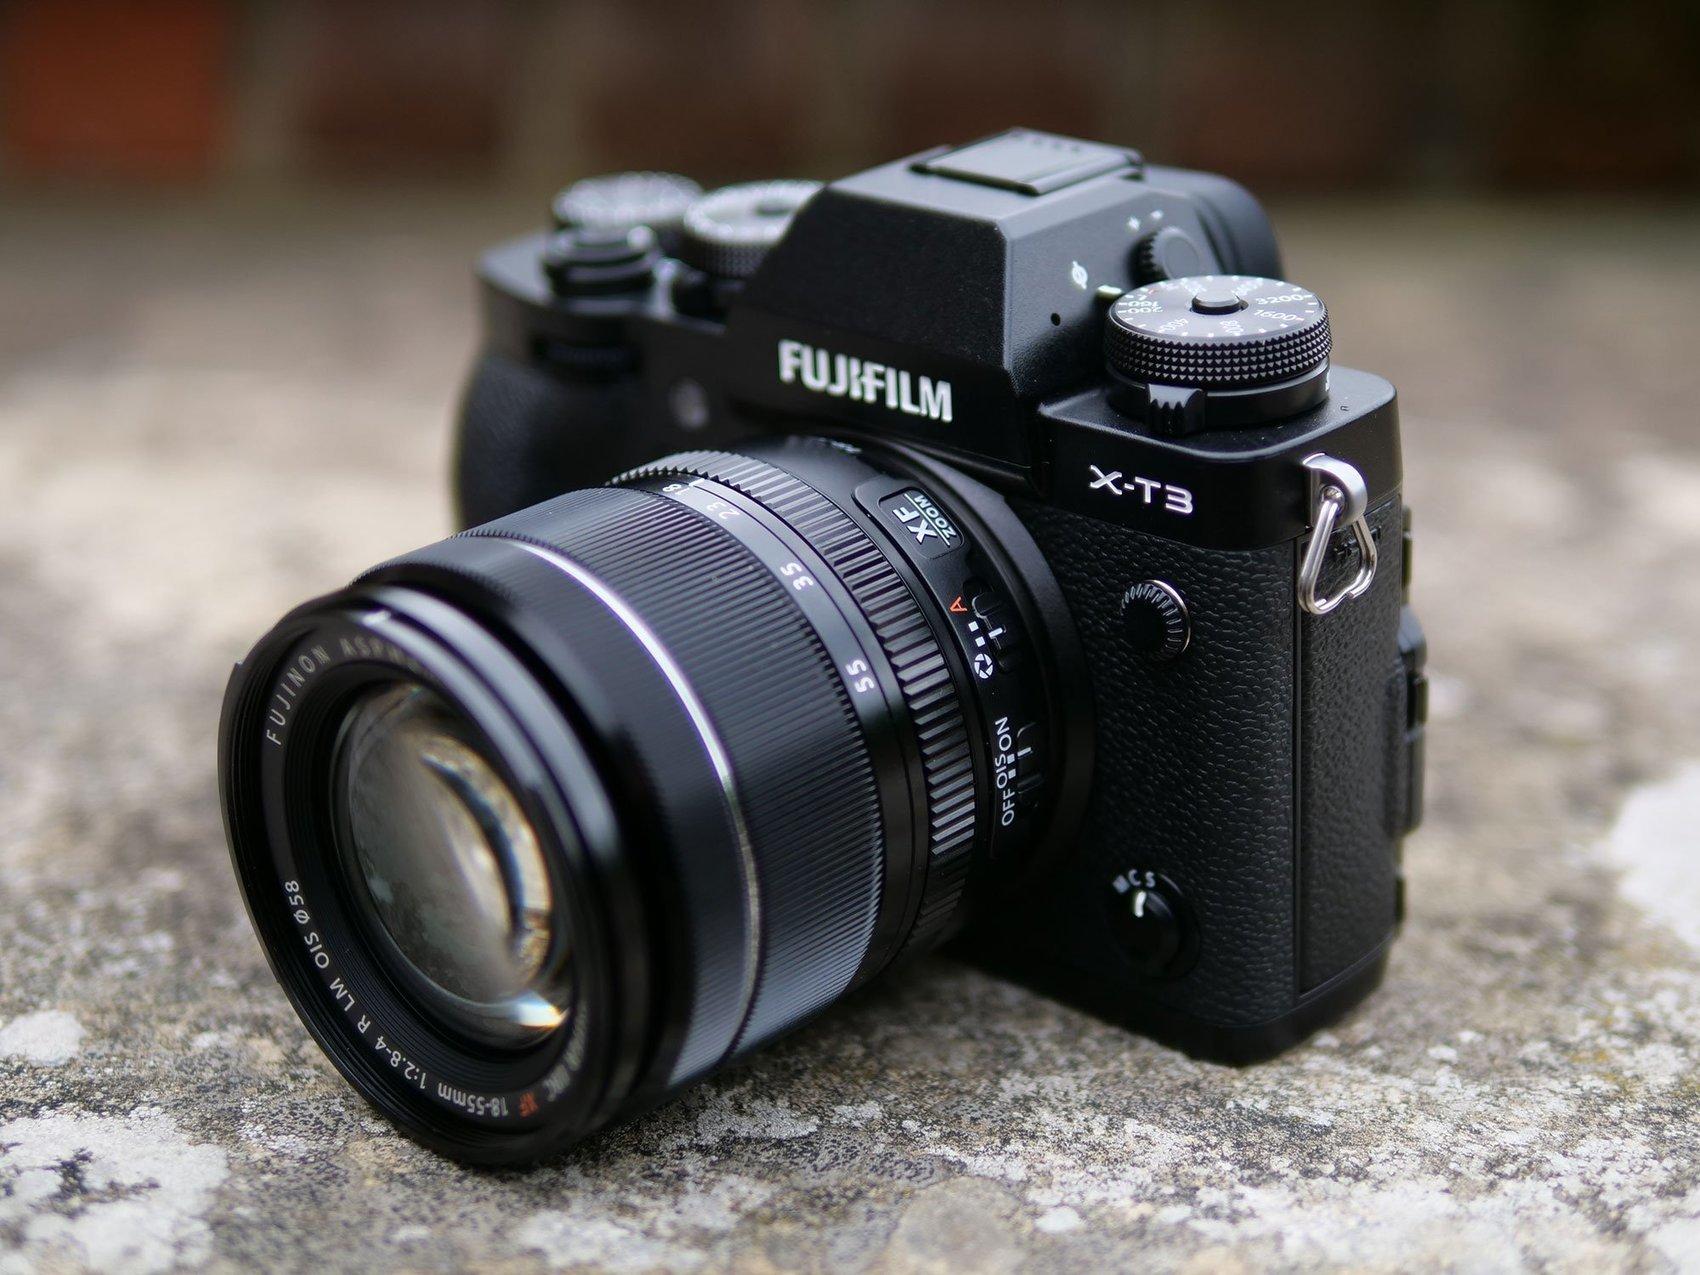 Fujifilm Xt3 Review Fujifilm X Series Aps C S